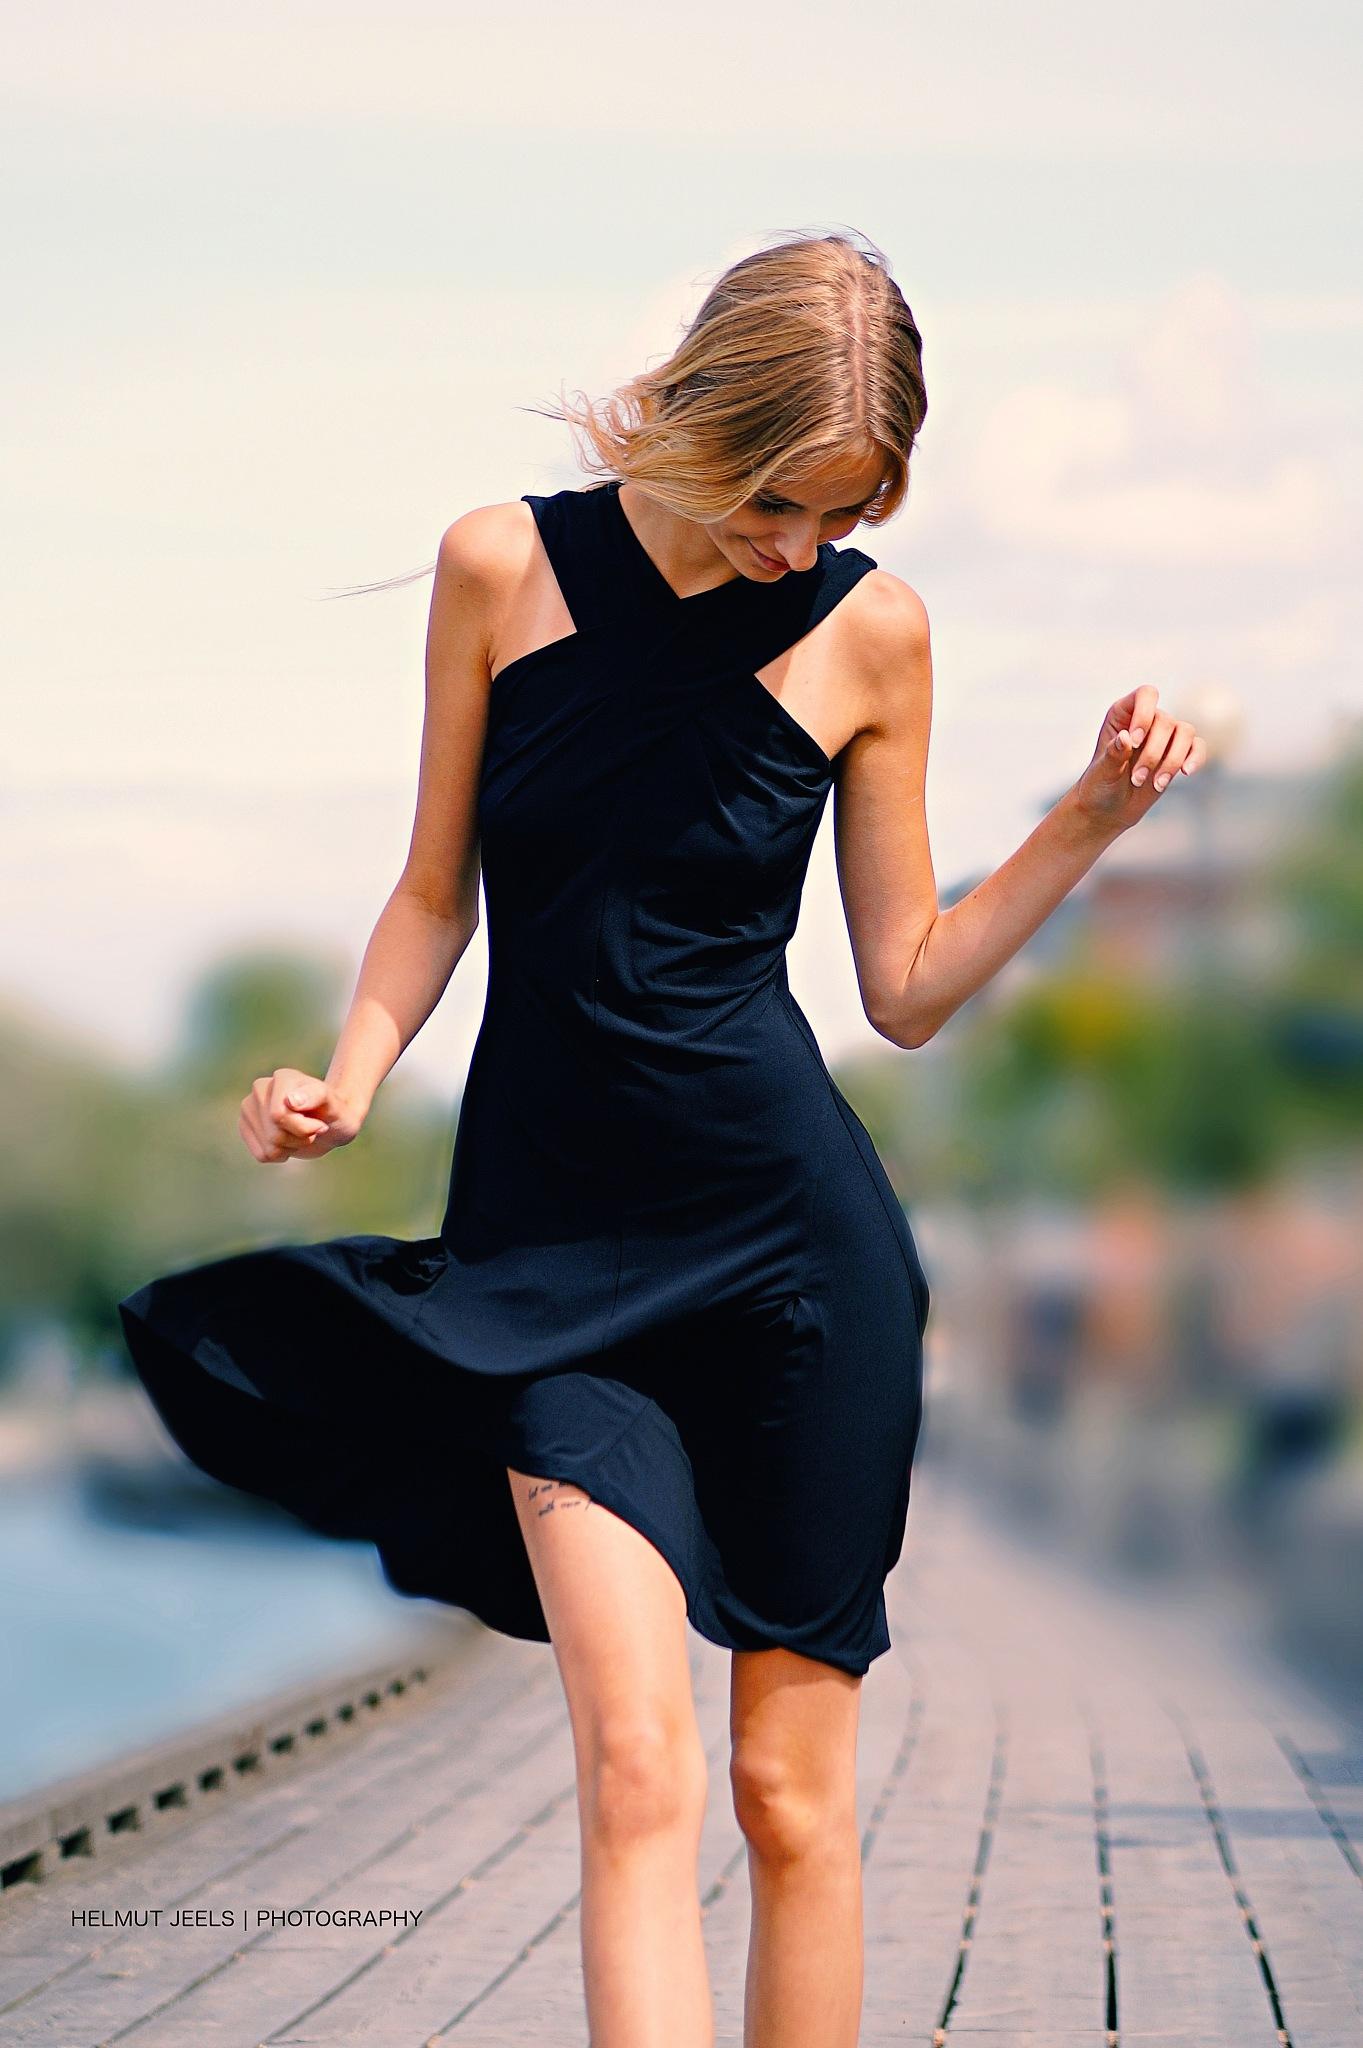 petite robe noir - new edit by Helmut Jeels